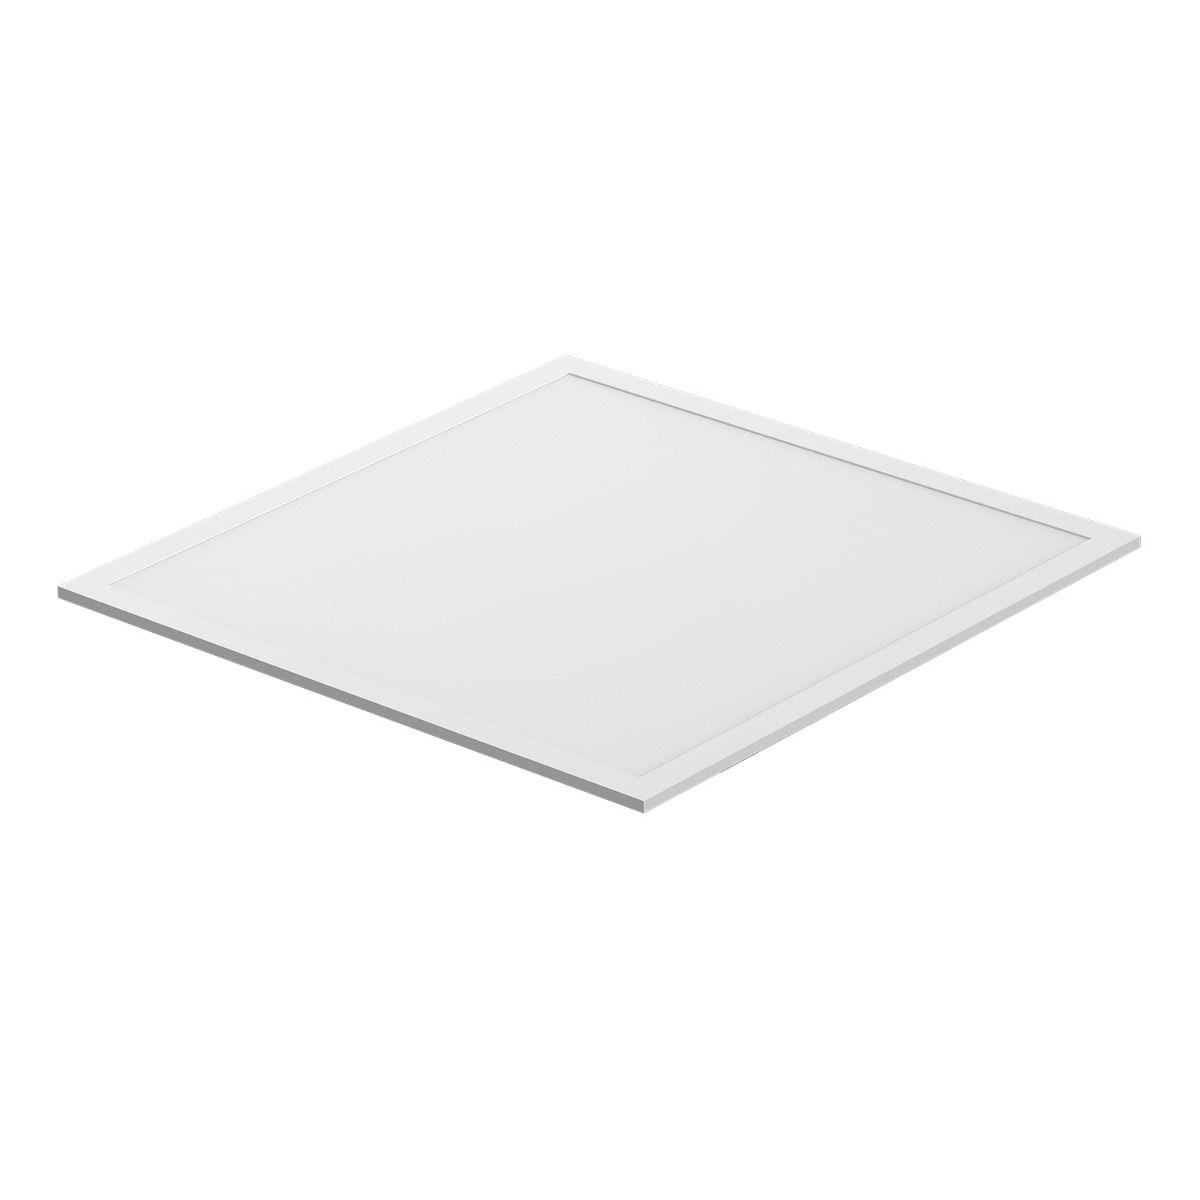 Noxion LED Panel Delta Pro V2.0 Xitanium DALI 30W 60x60cm 3000K 3960lm UGR <19 | Dali Dimmable - Warm White - Replaces 4x18W